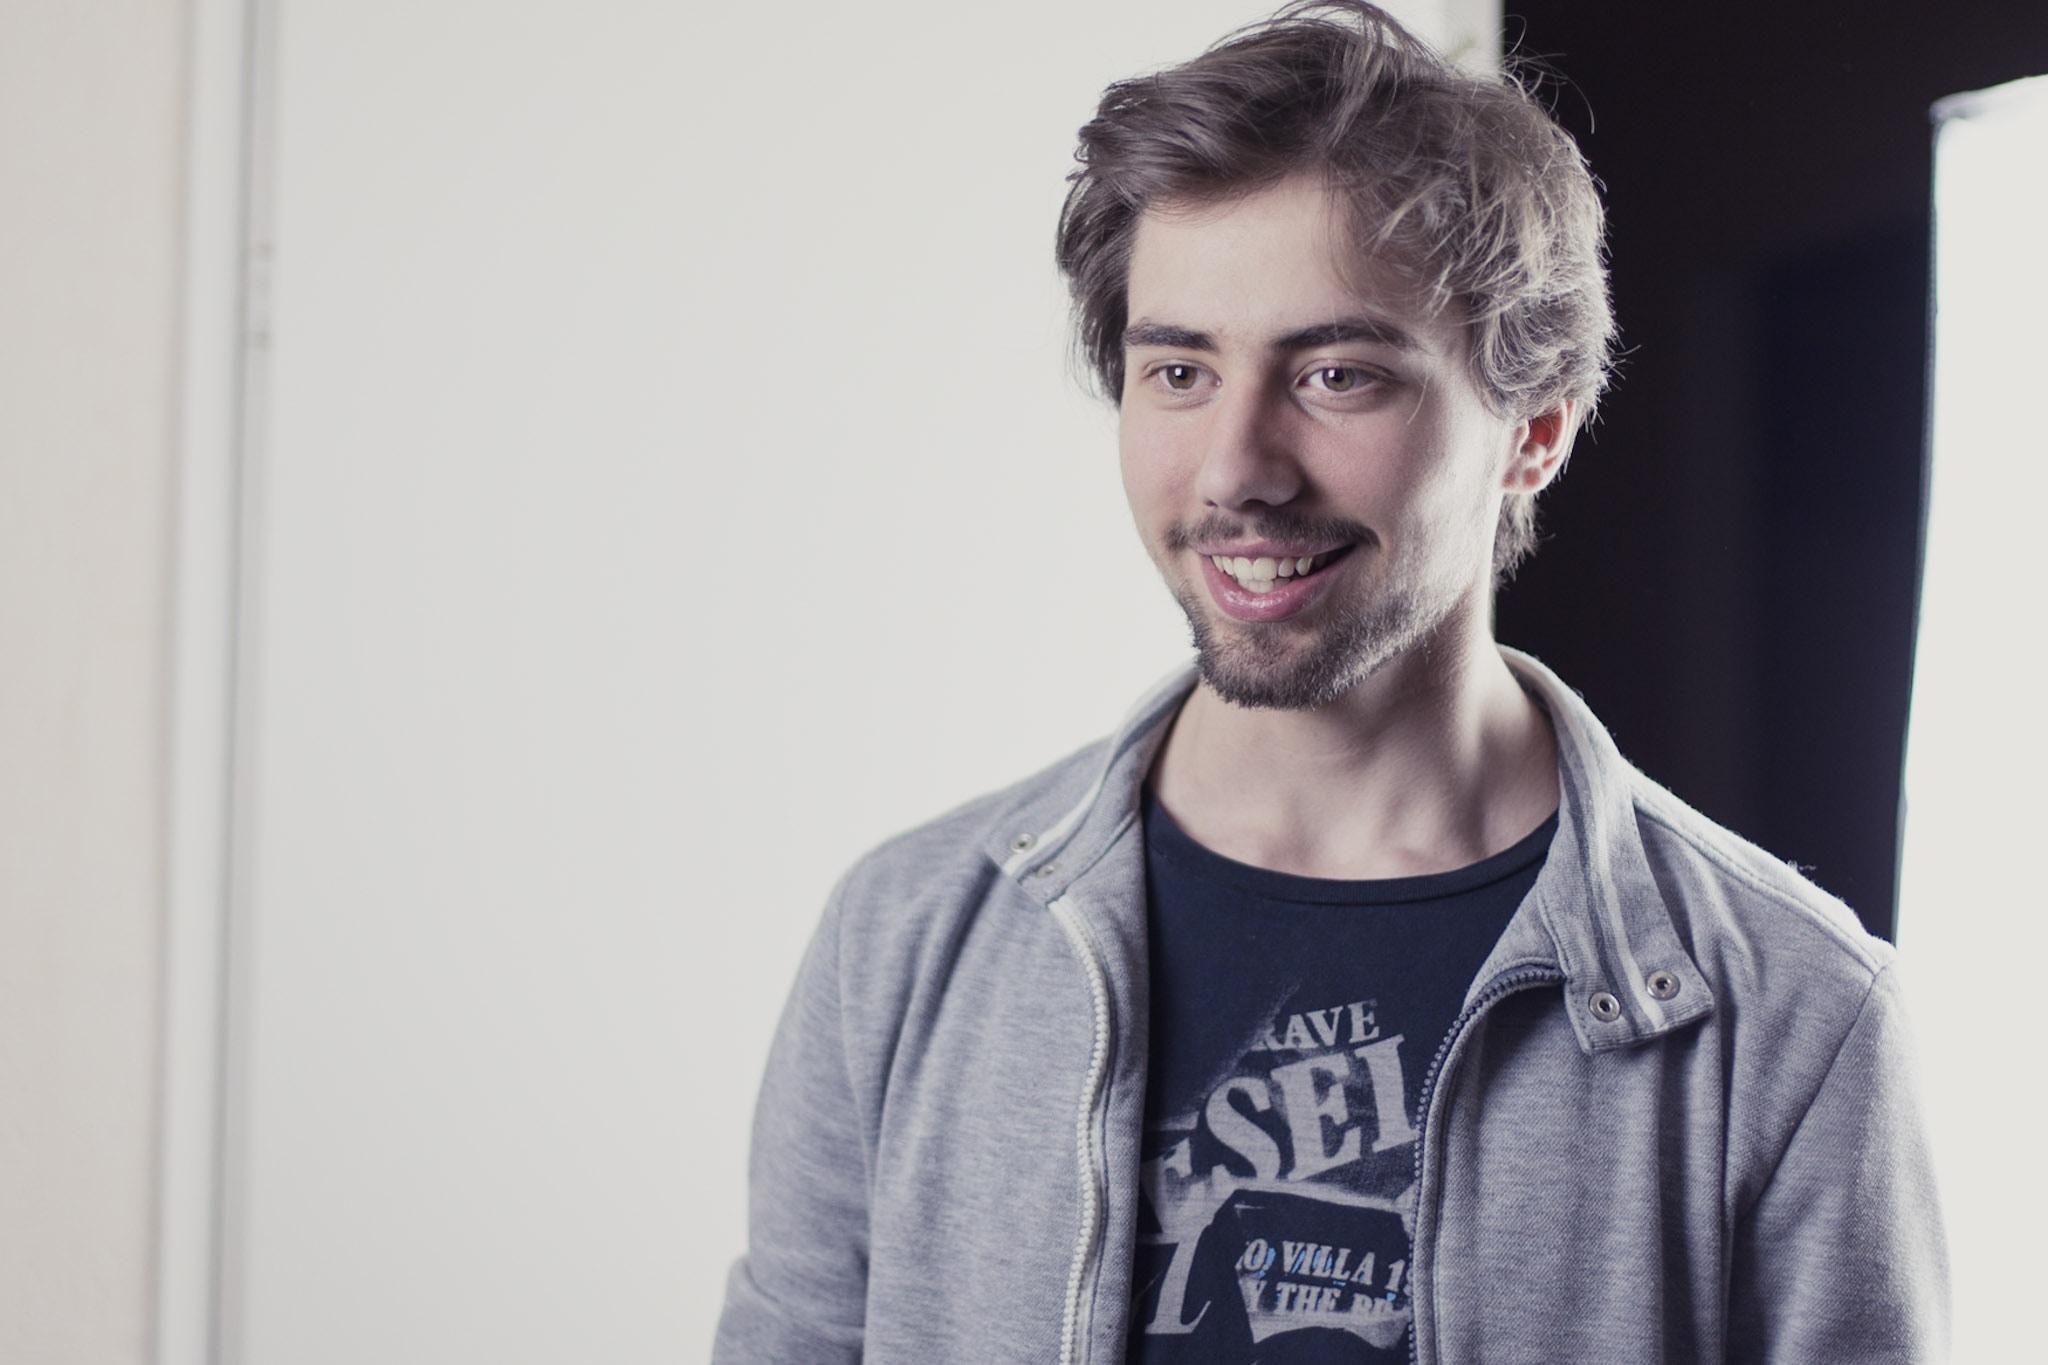 Go to Maxime Rossignol's profile